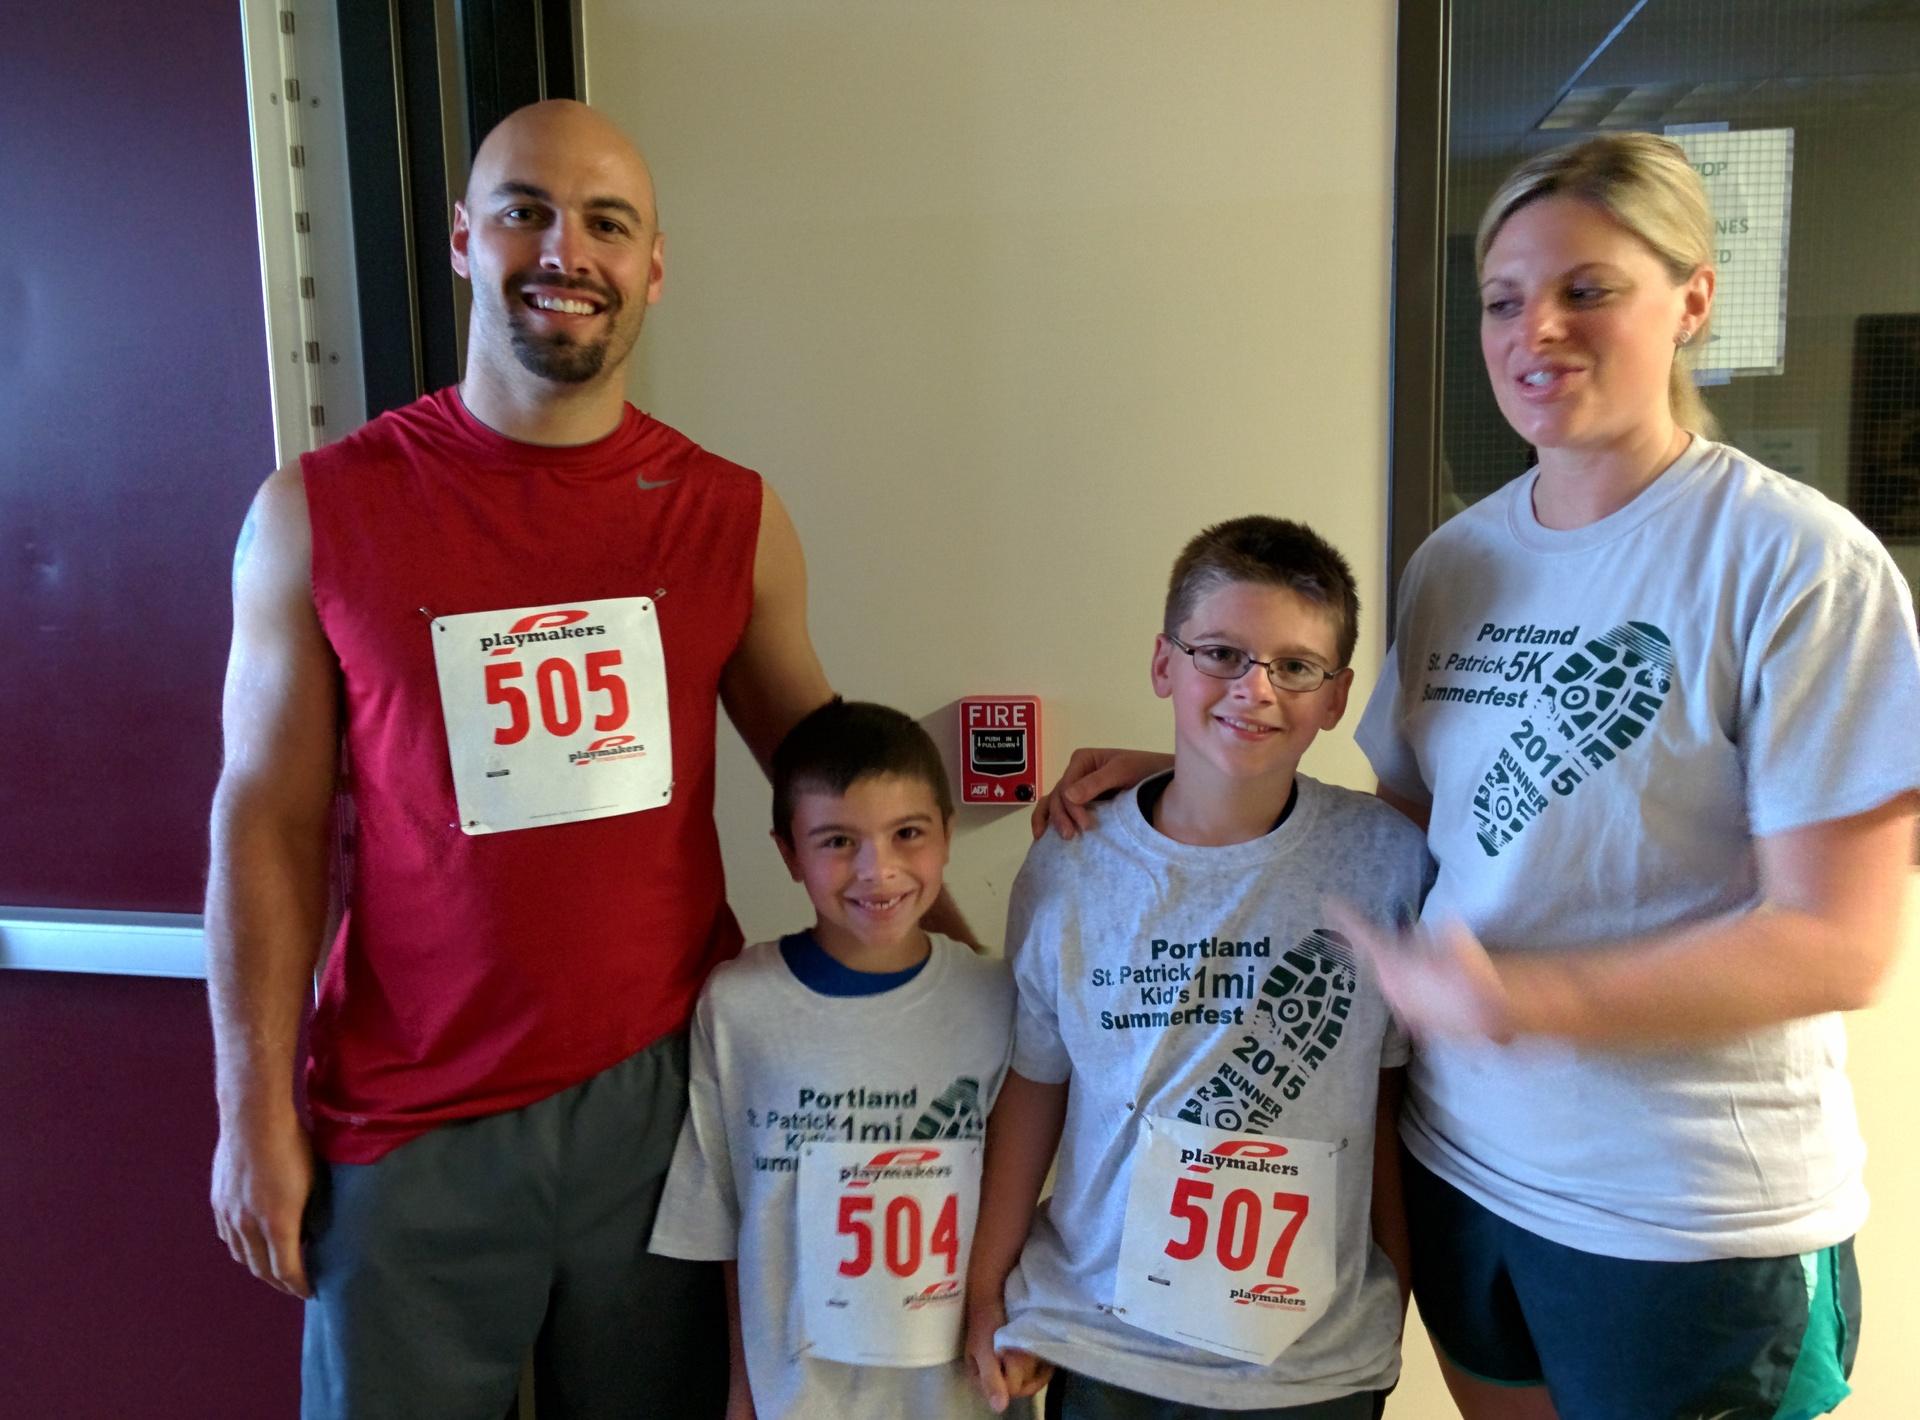 Families getting ready for the Fun Run